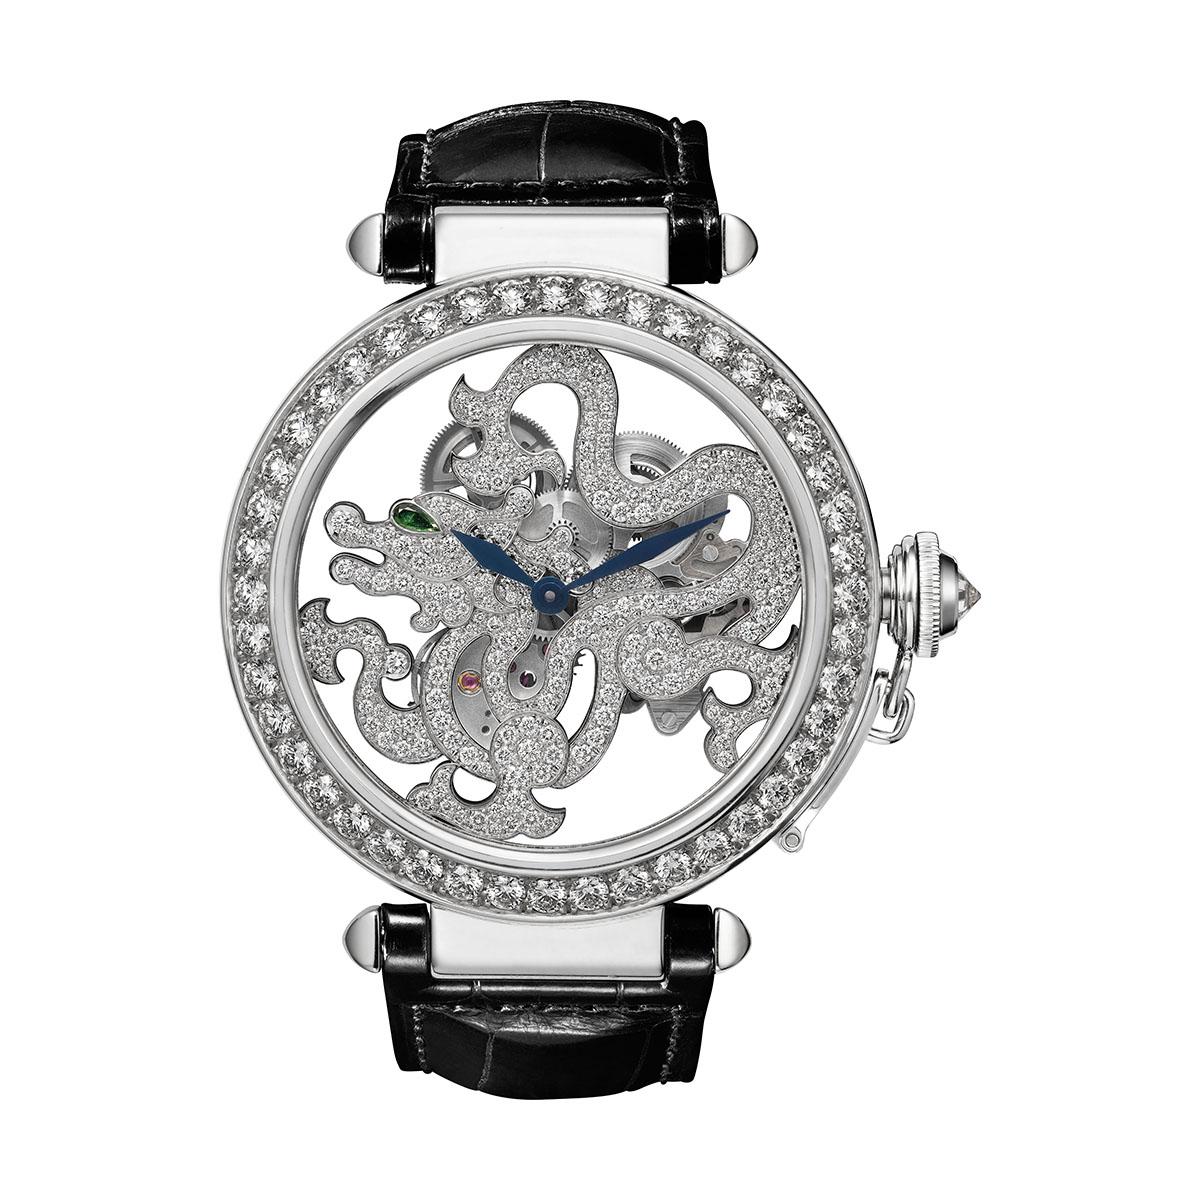 Pasha de Cartier Skeleton Dragon Motif watch, strap set with brilliant-cut diamonds; limited edition of 10 watchs, black alligator leather strap